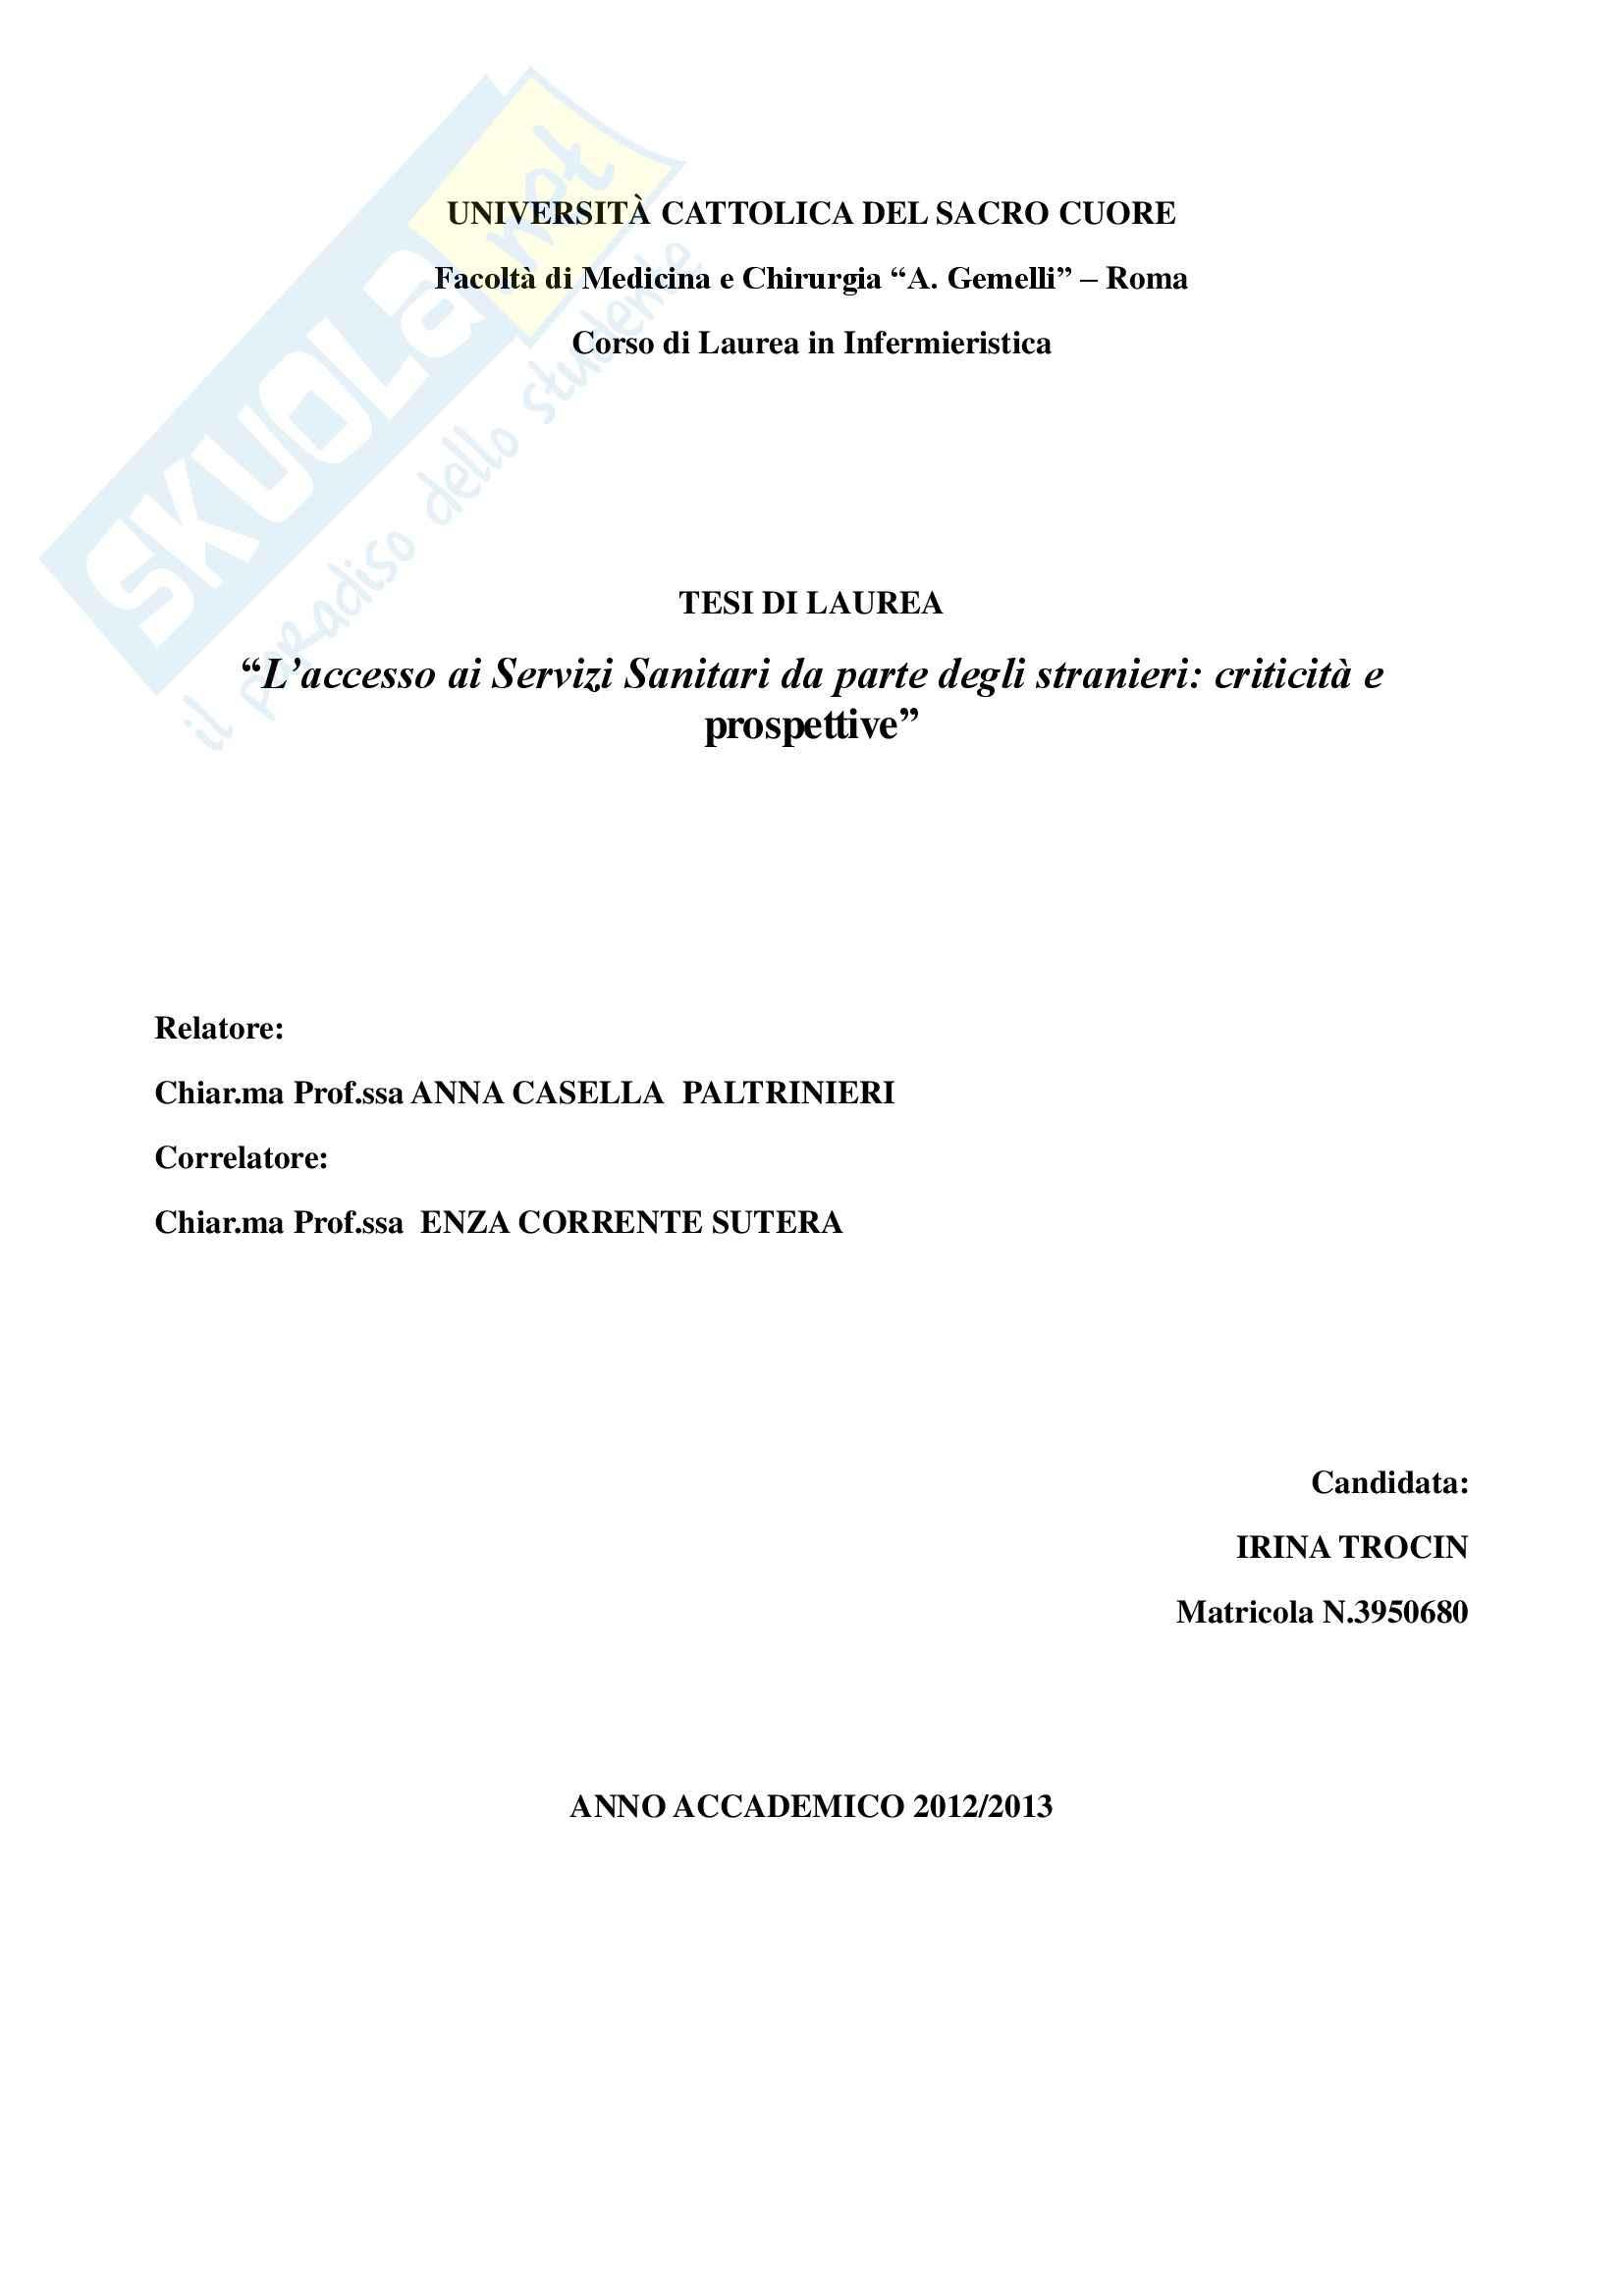 tesi A. Casella Paltrinieri Infermieristica transculturale